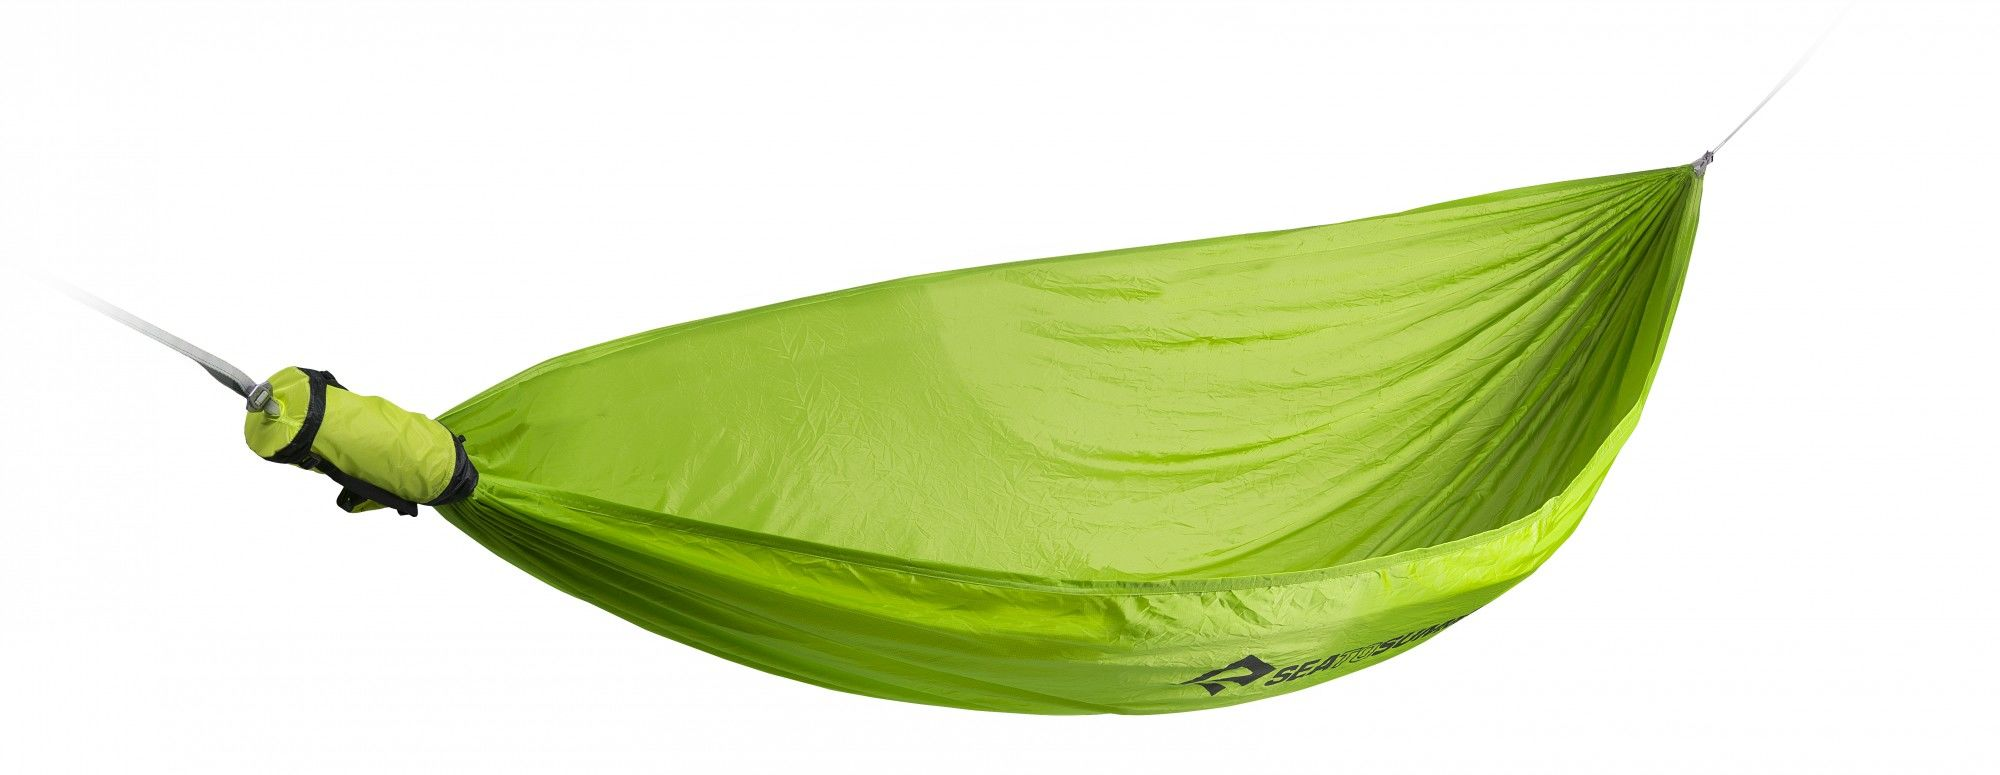 Sea to Summit Hammock Pro Single Grün, One Size -Farbe Lime, One Size